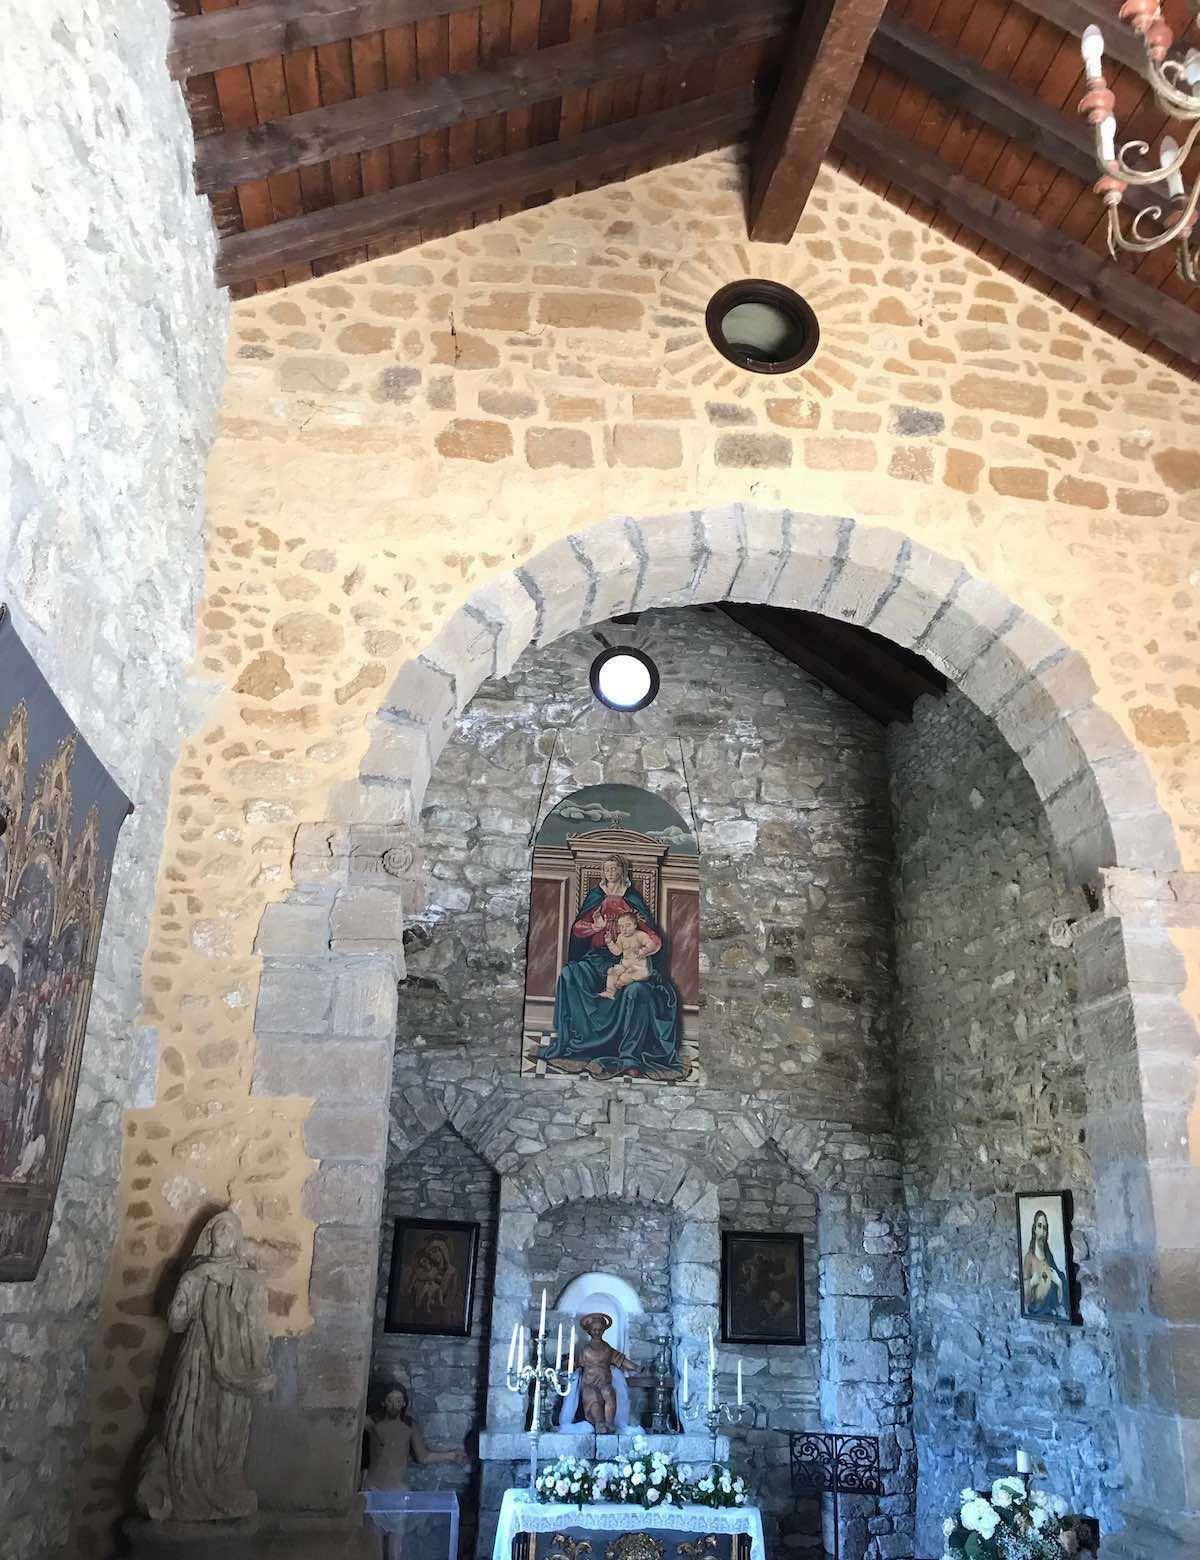 Castello Chiaramonte hosts the Church of St Lorenzo